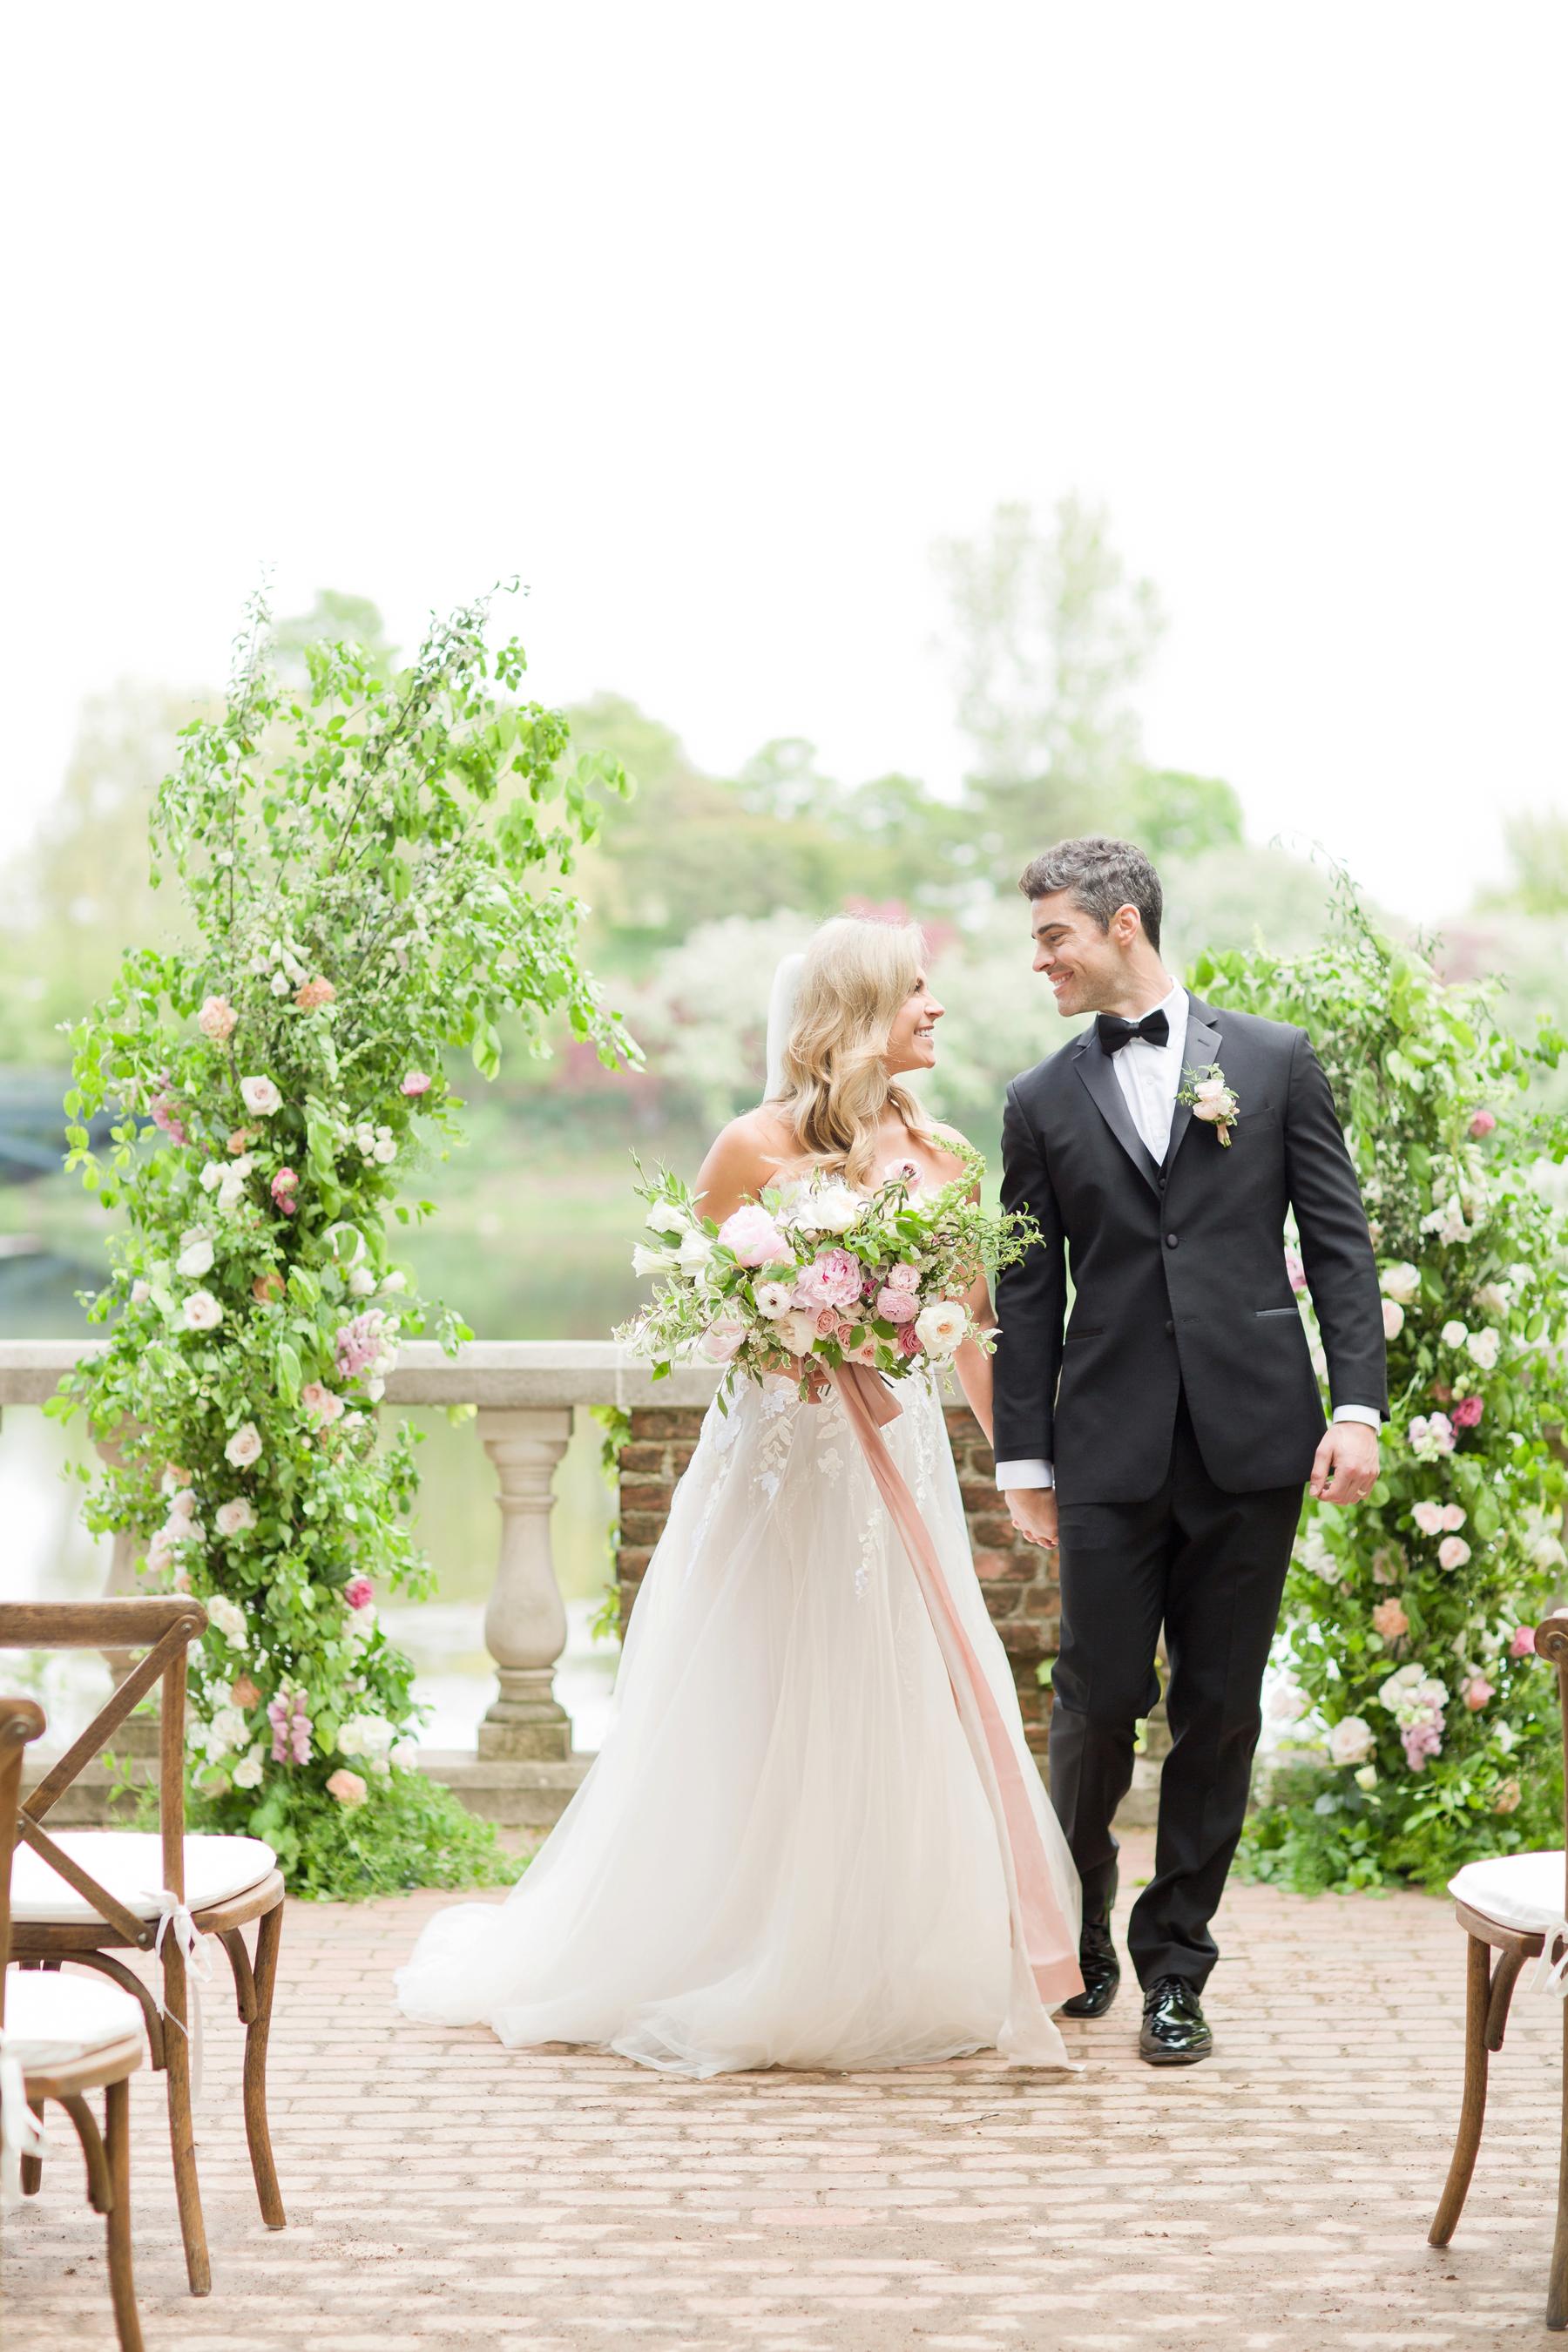 Romantic Chicago Botanic Garden Wedding Inspiration  Lakeshore in Love